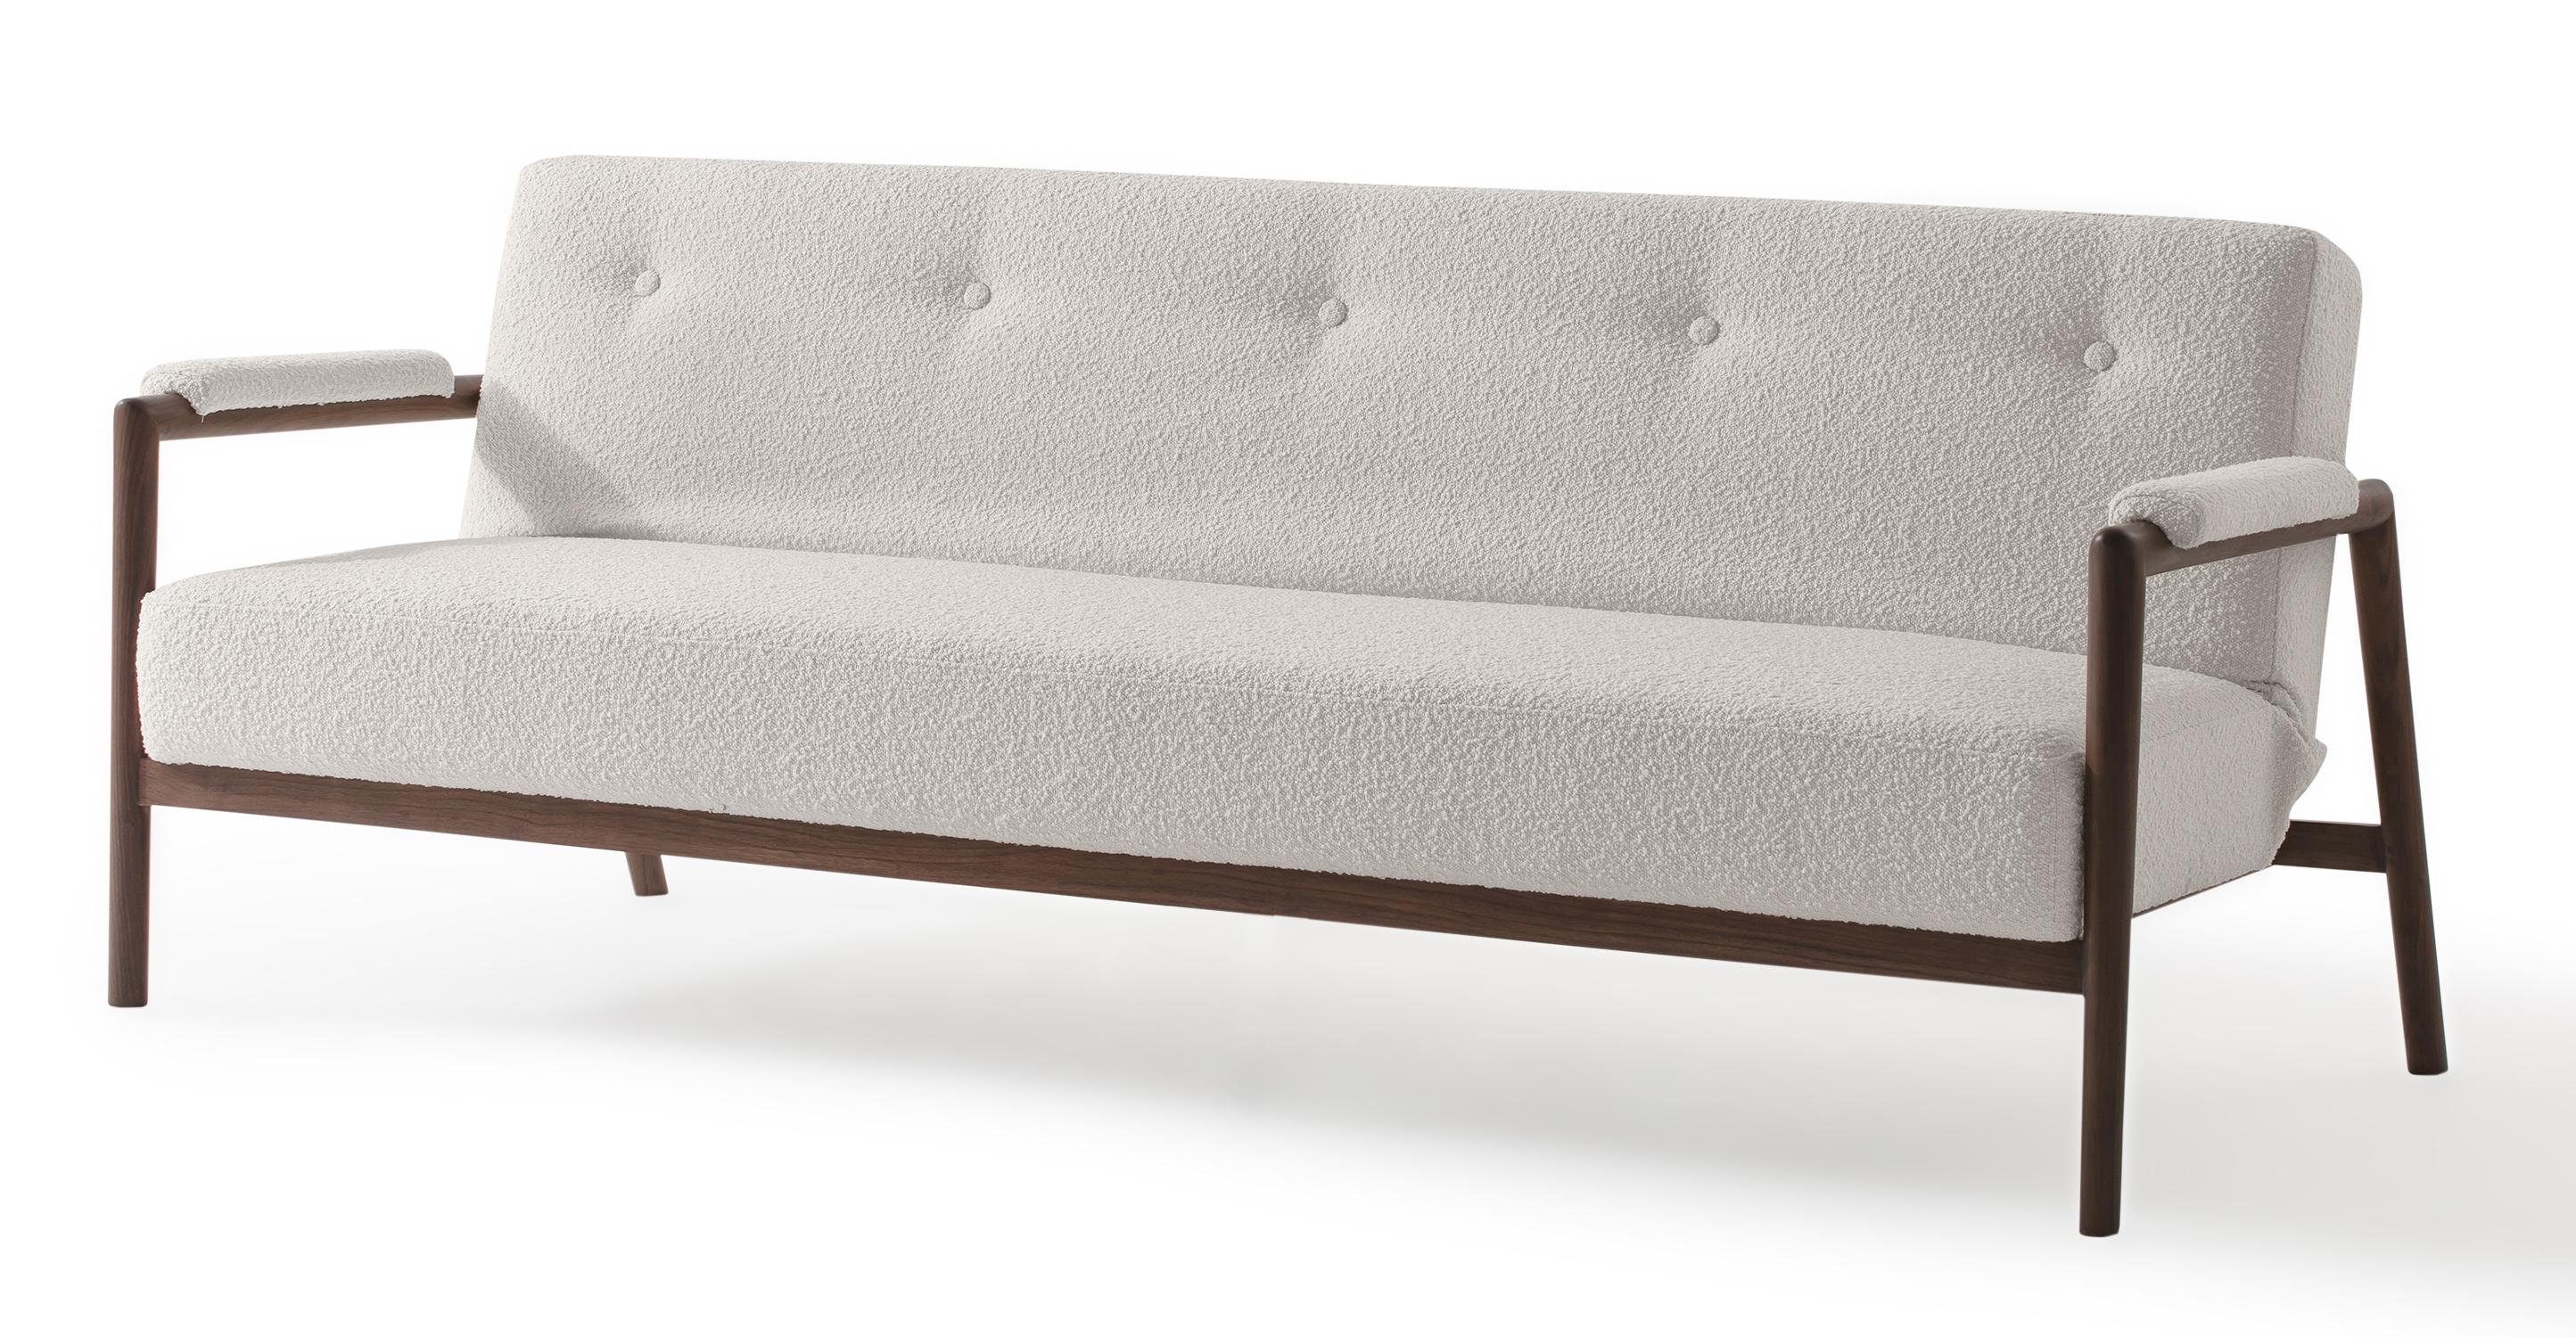 "Orson 85"" Fabric Sofa Sleeper, Blanc Boucle"